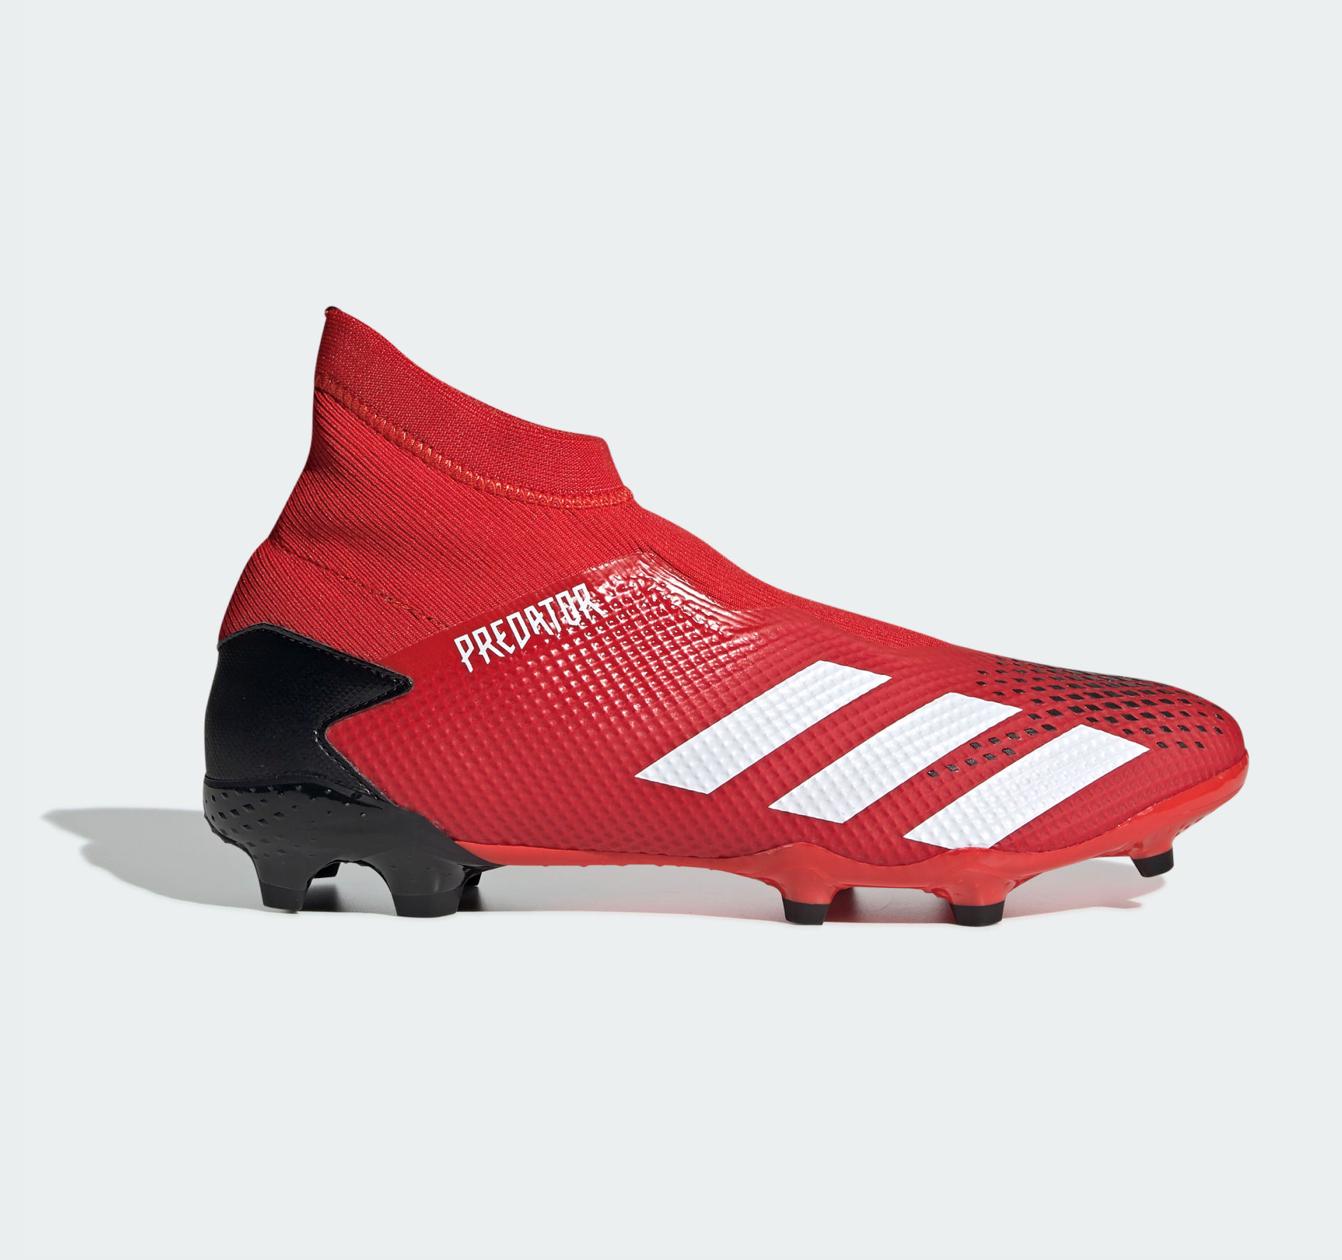 Sociedad elemento acerca de  Adidas predator 20.3 ll fg ee9554- Nava Sport - din nye sportsbutikk!